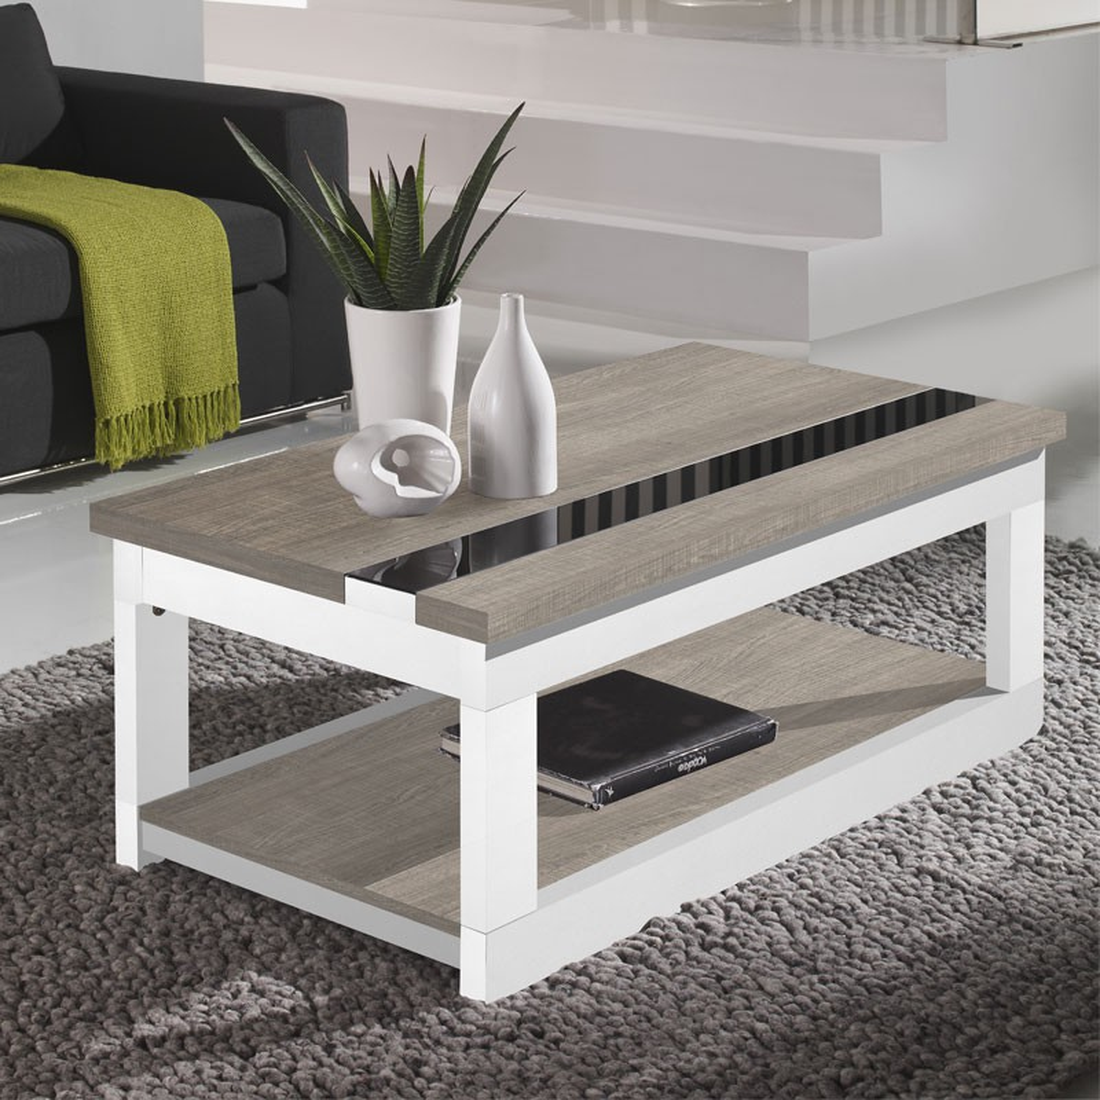 table basse relevable ch ne clair bois blanc upti. Black Bedroom Furniture Sets. Home Design Ideas